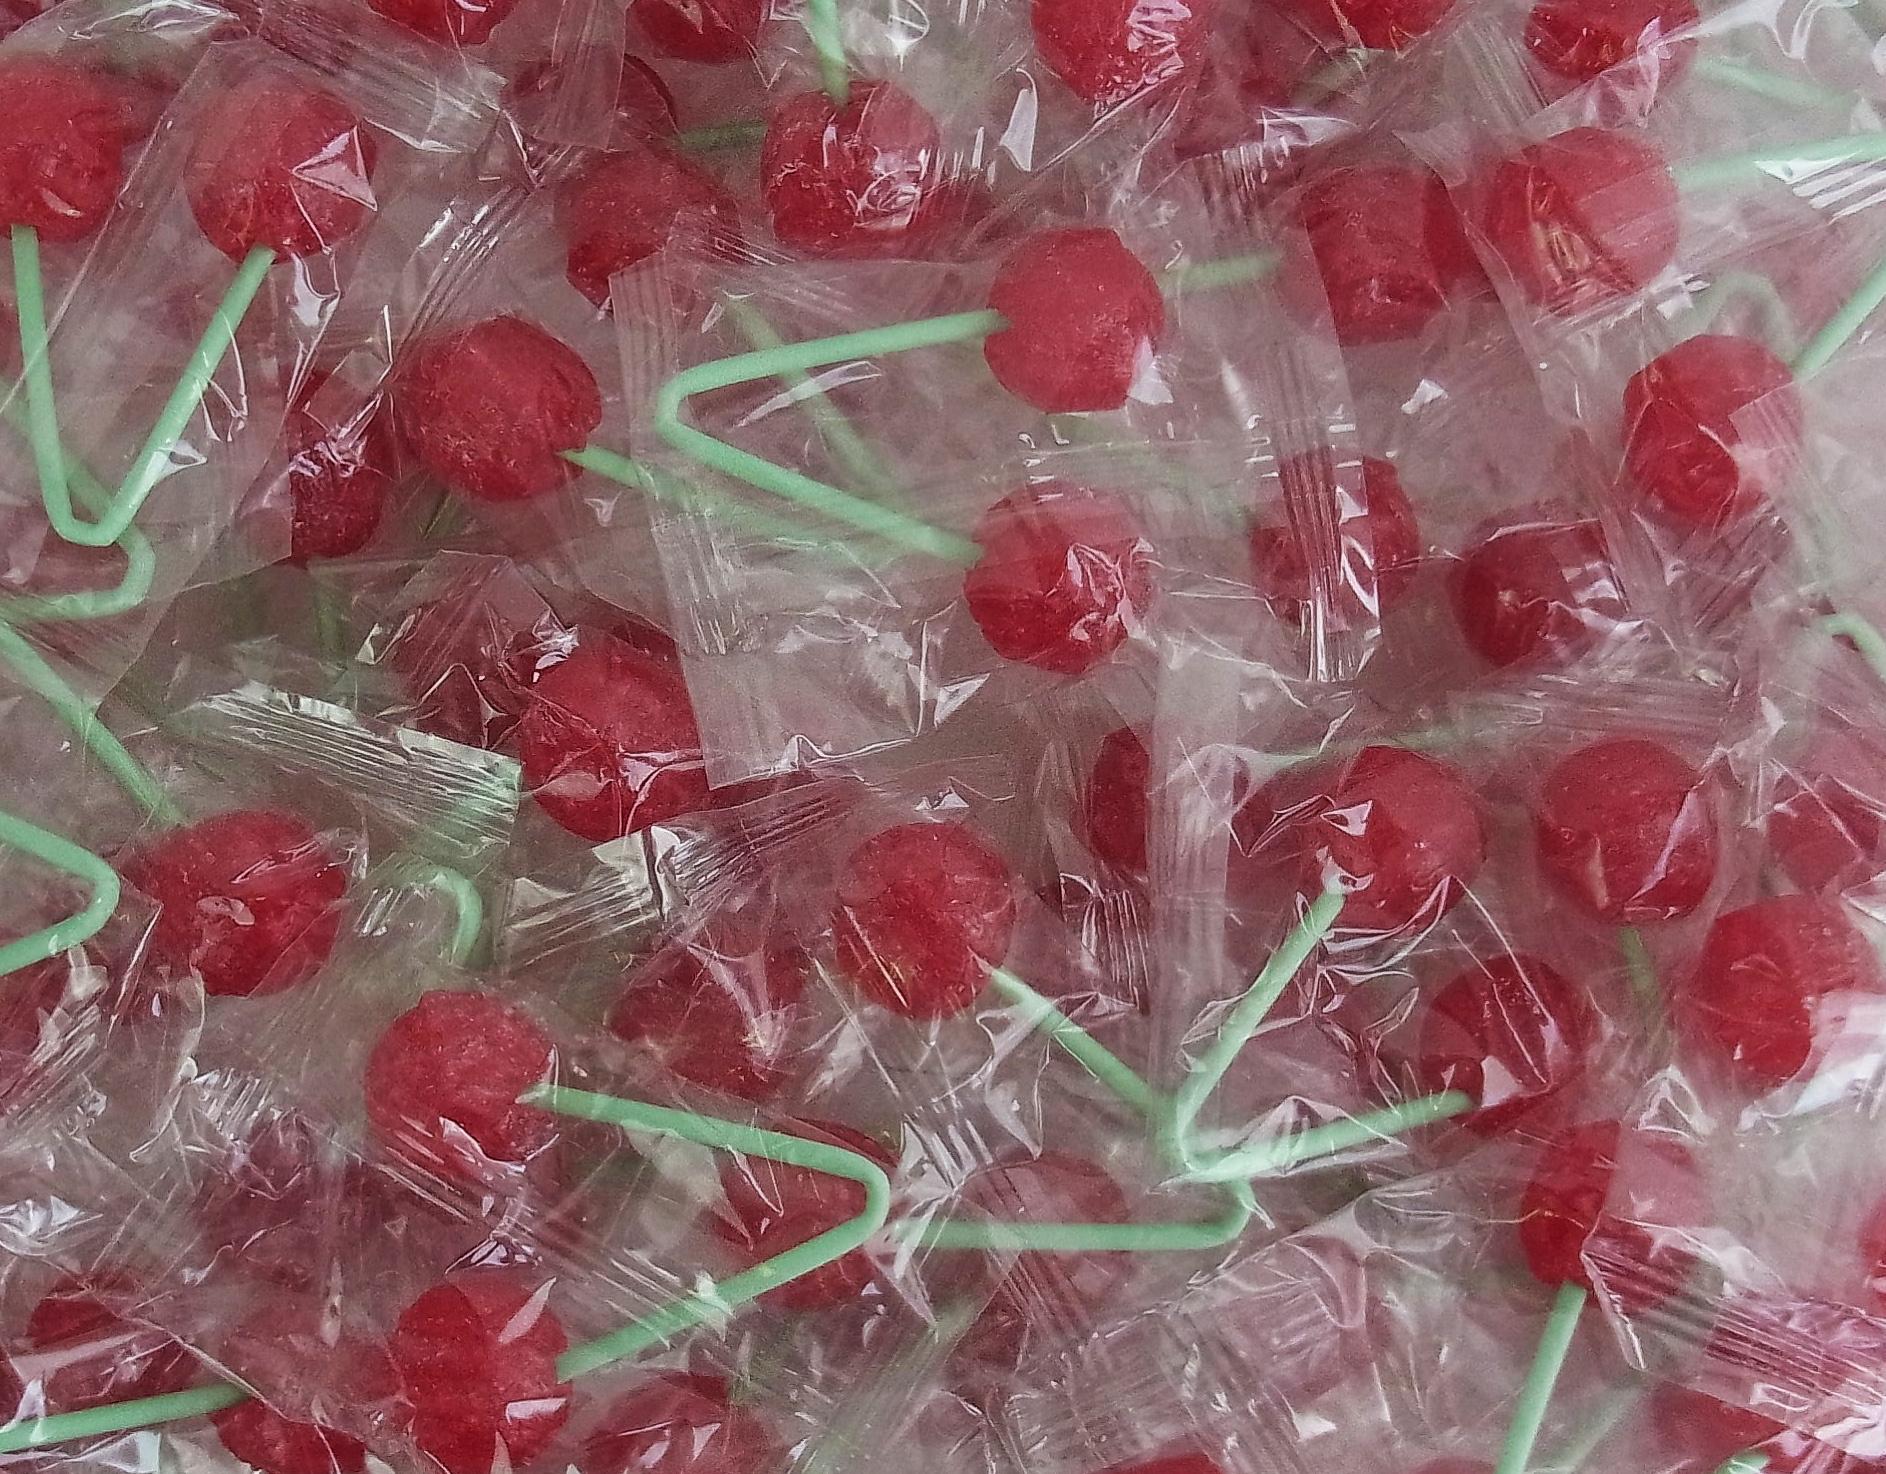 CAPTAIN PLAY Kirsch Lollis, Party Bucket mit 70 Doppel - Kirsch Lutschern, 1er Pack (1 x 945g)